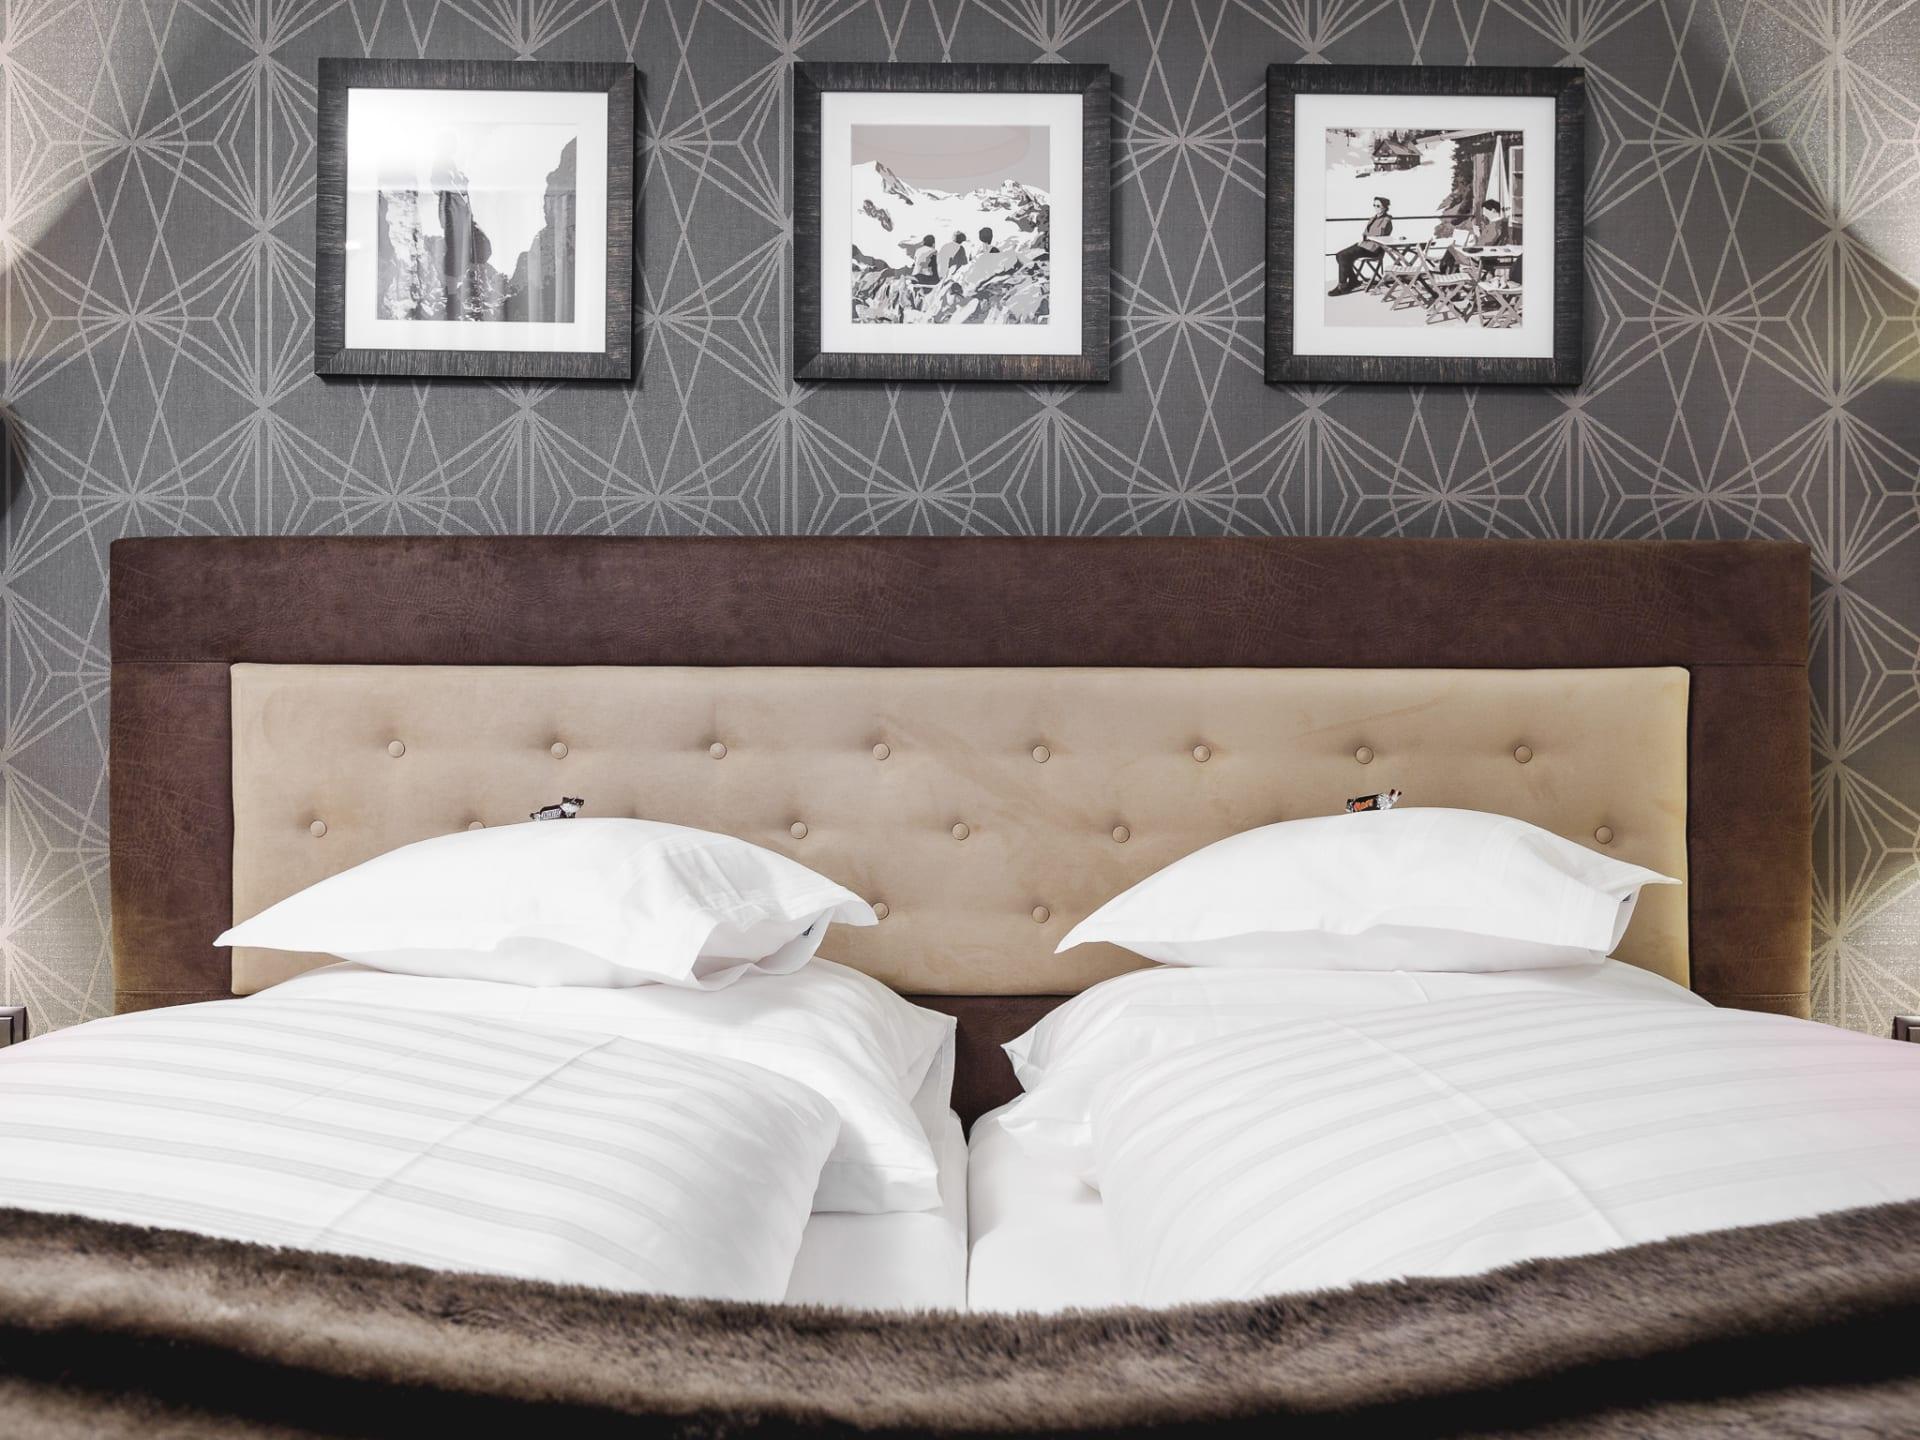 Tolle Modernes Design Zimmer Fotos - Images for inspirierende Ideen ...